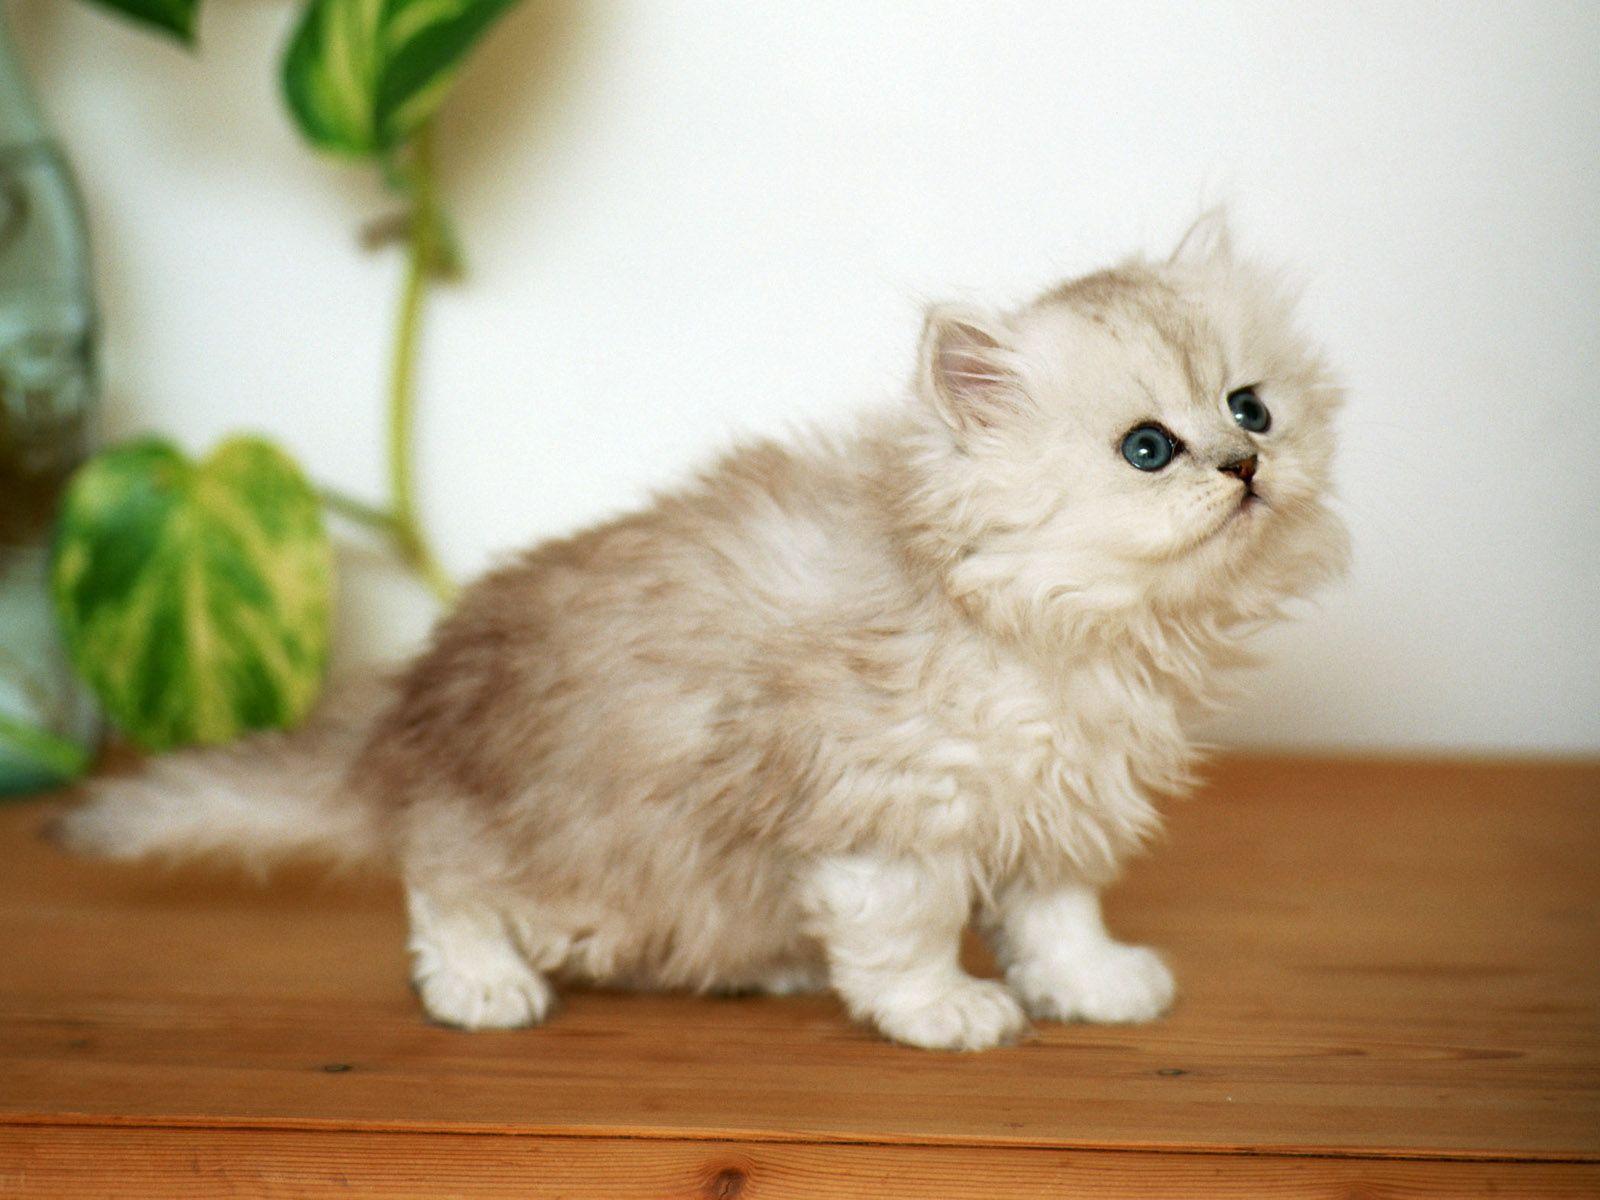 Cute White Fluffy Kitten wallpaper Cats Pinterest